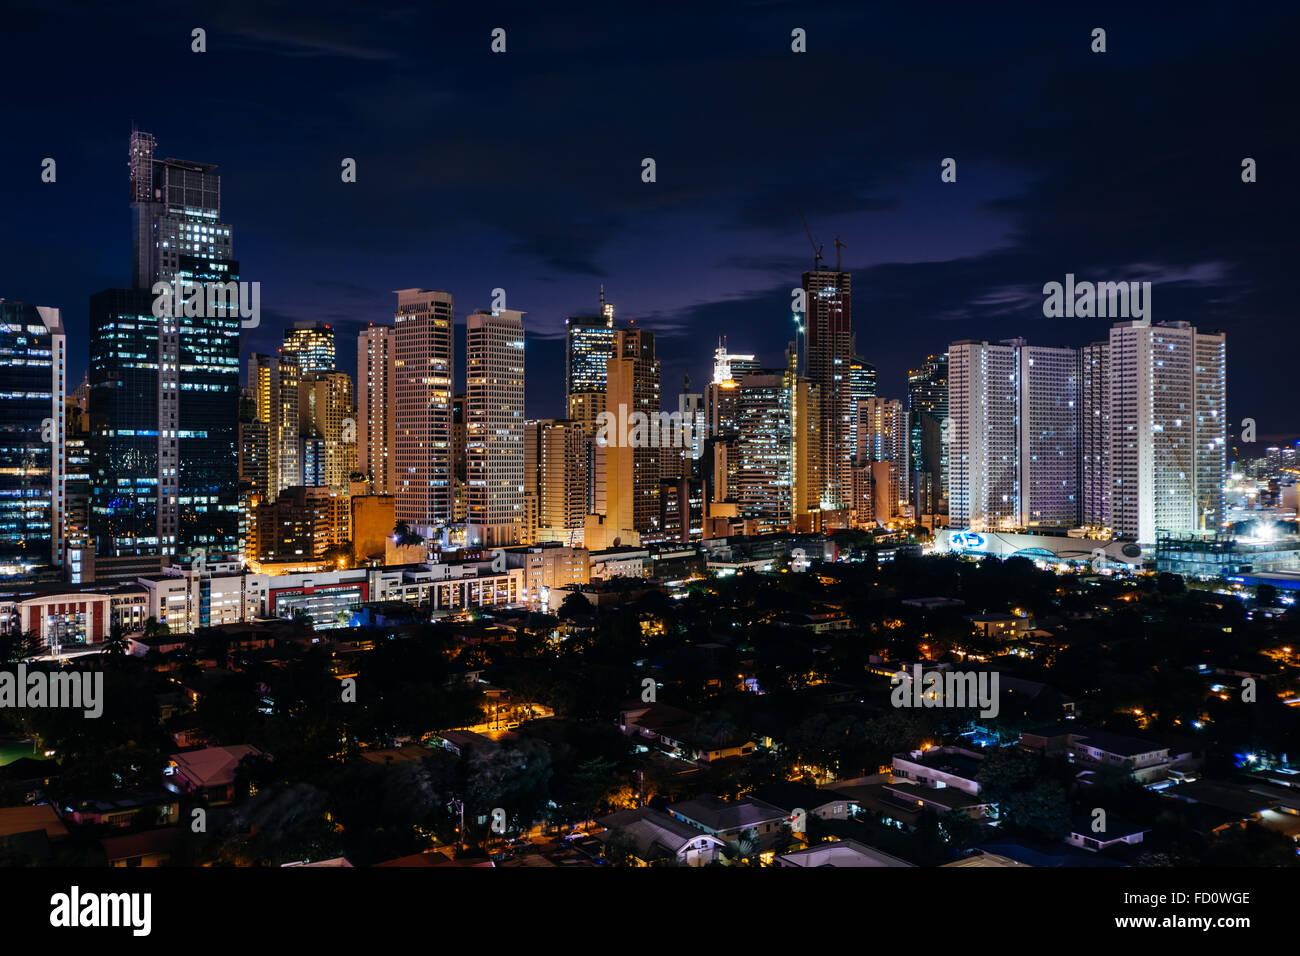 night skyline view of - photo #39